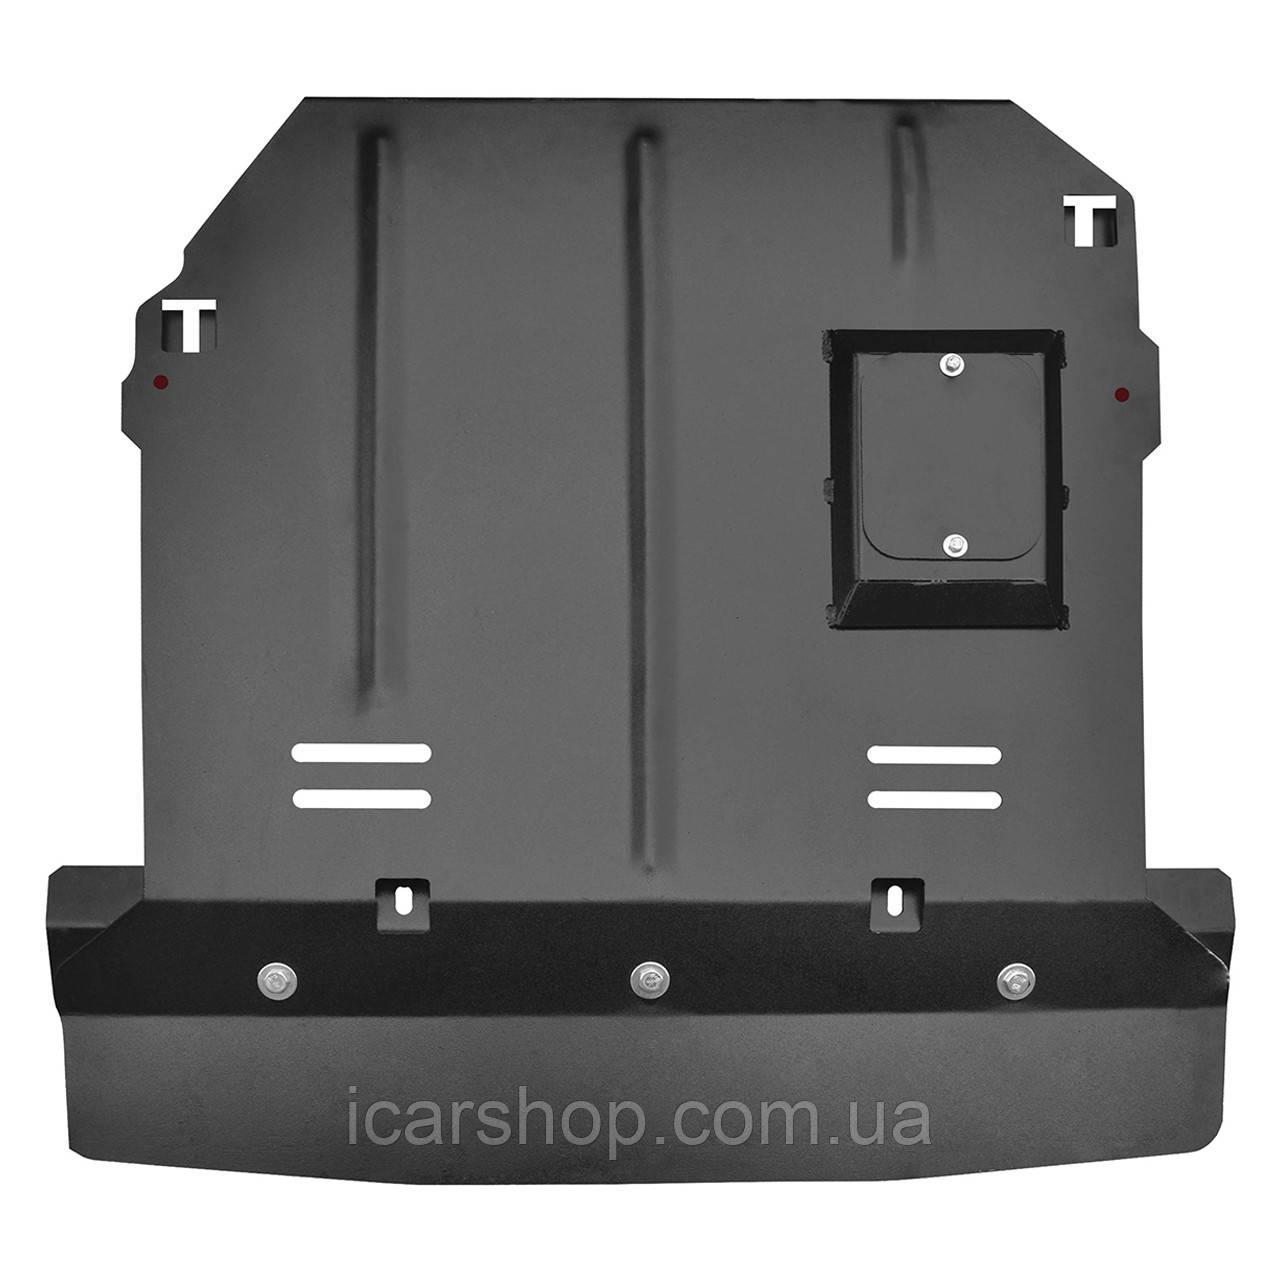 Захист Двигуна / КПП / Радіатора Mercedes Vito I 01-03 / V-Klasse (2,2 CDI) Titan